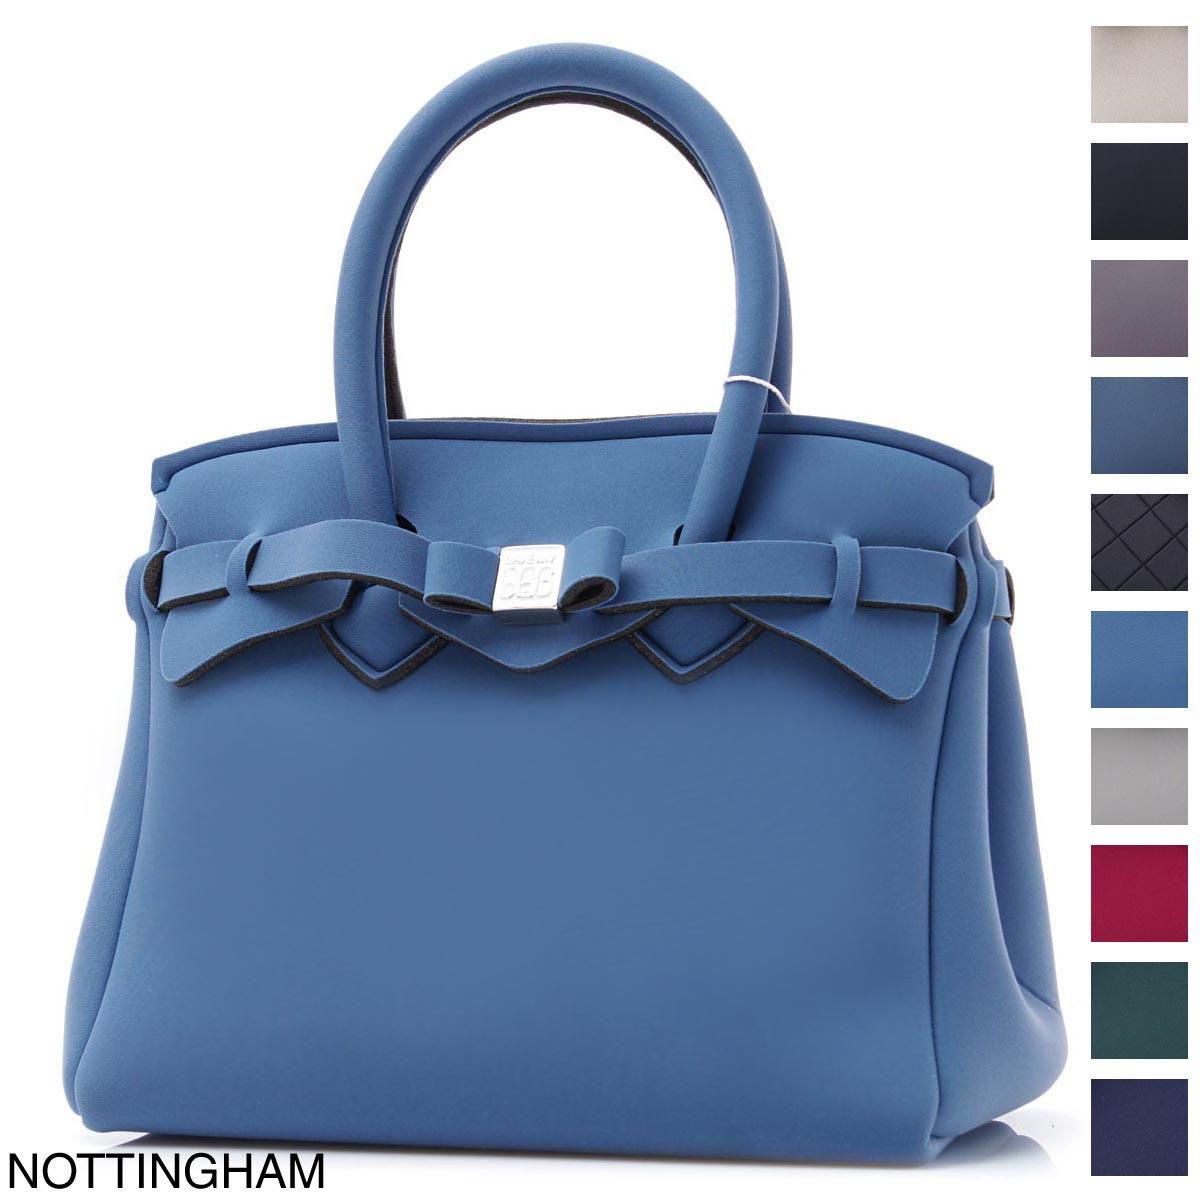 Save Mai Bag My Handbag Lady S Tote Fashion Commuting Attending School Lycra Light Weight Present Peie Miss 10104n Toffee Error